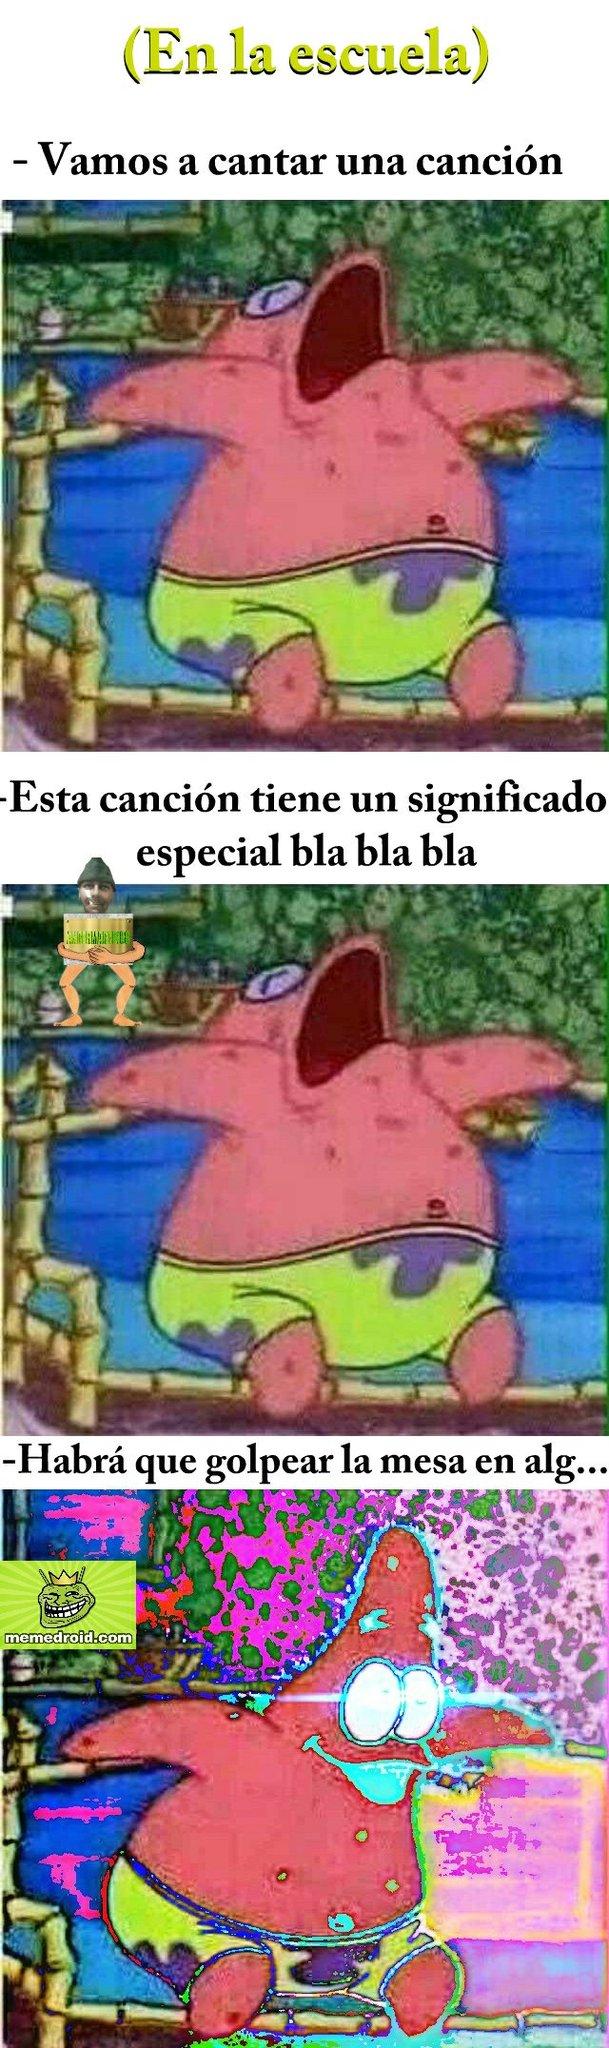 Normo - meme